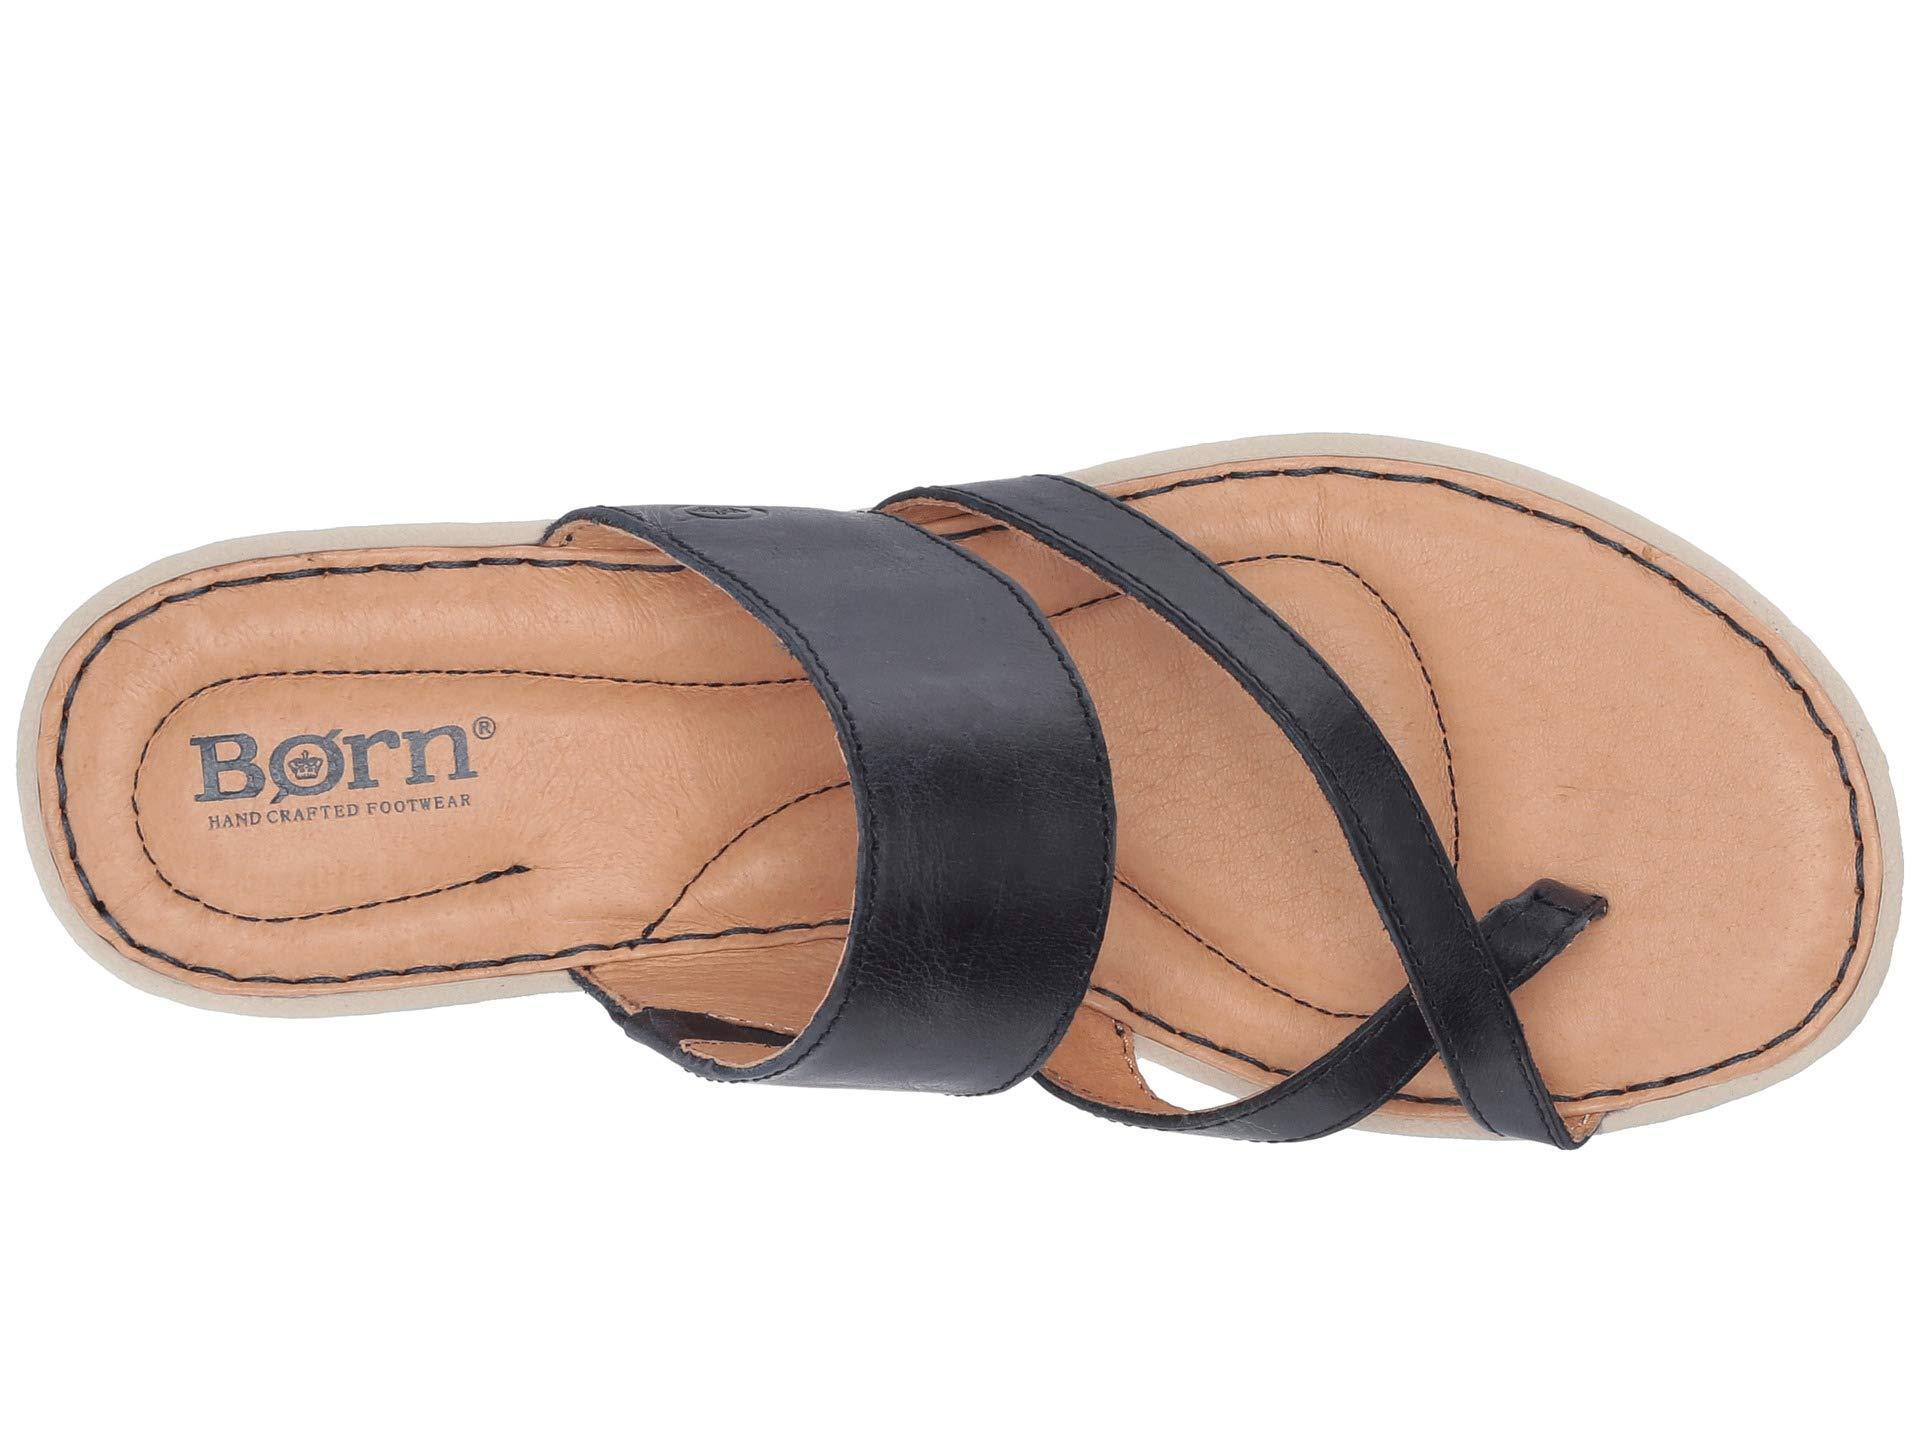 7970a3f866a7 Lyst - Born Siene (black Full Grain Leather) Women s Shoes in Blue